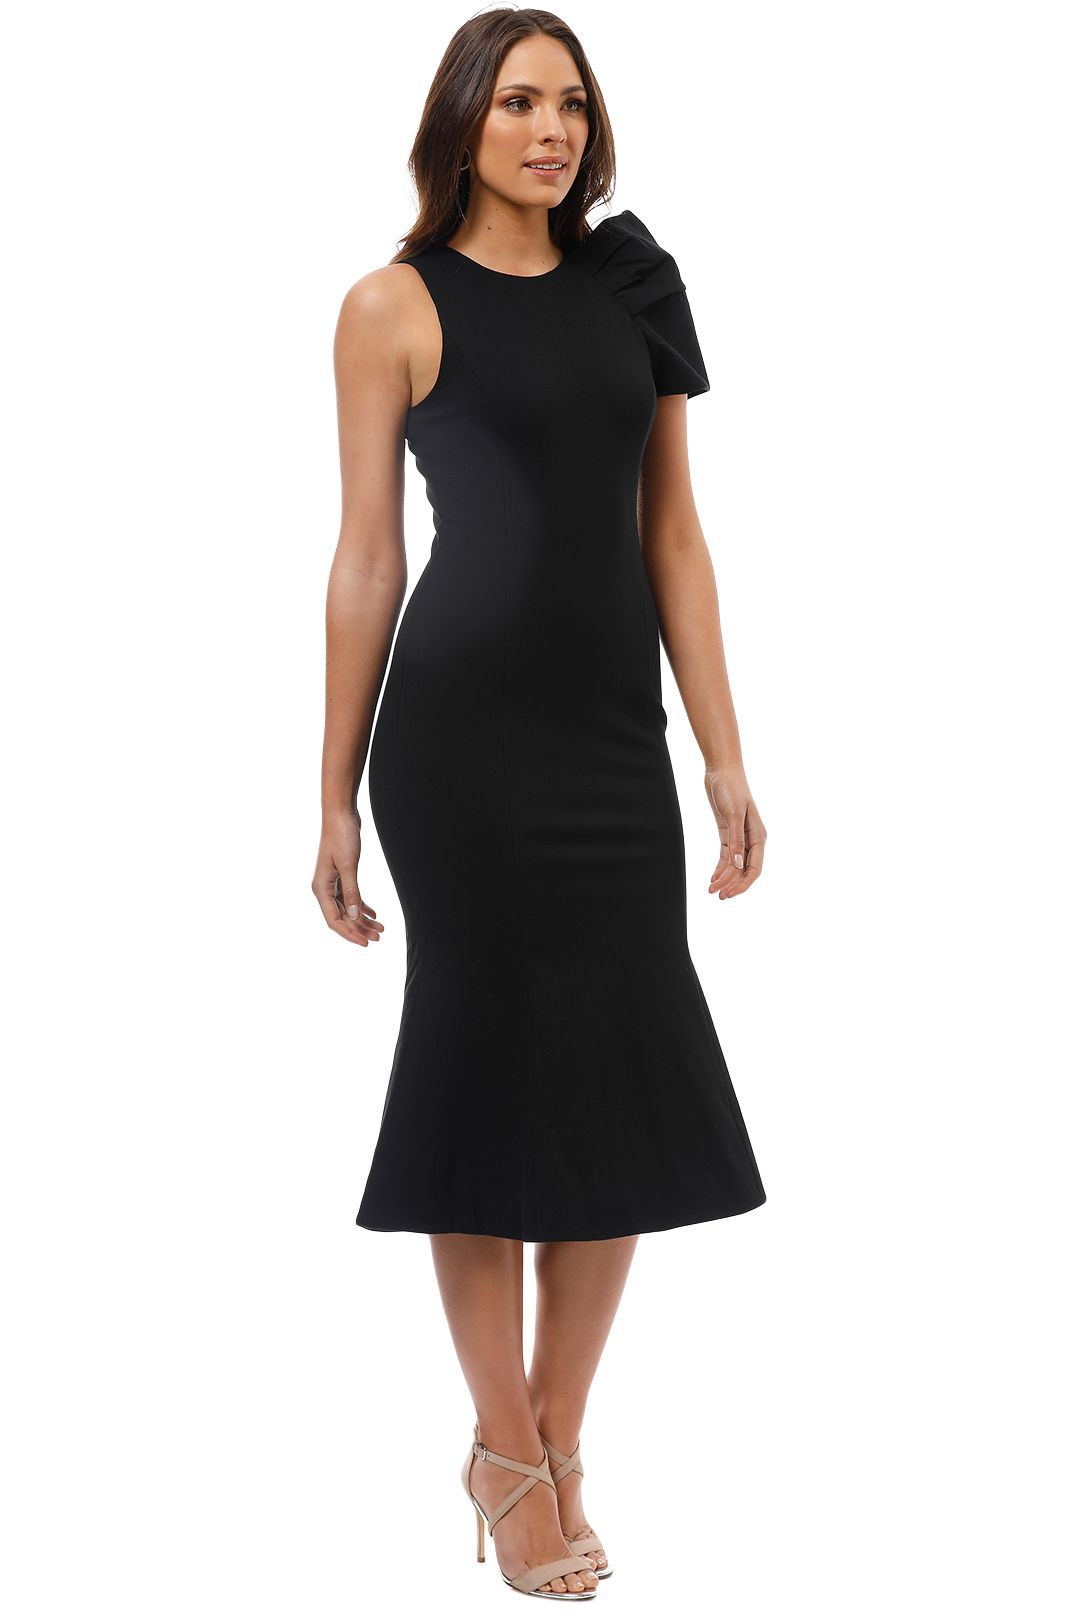 Elliatt - Imperial Dress - Black - Side